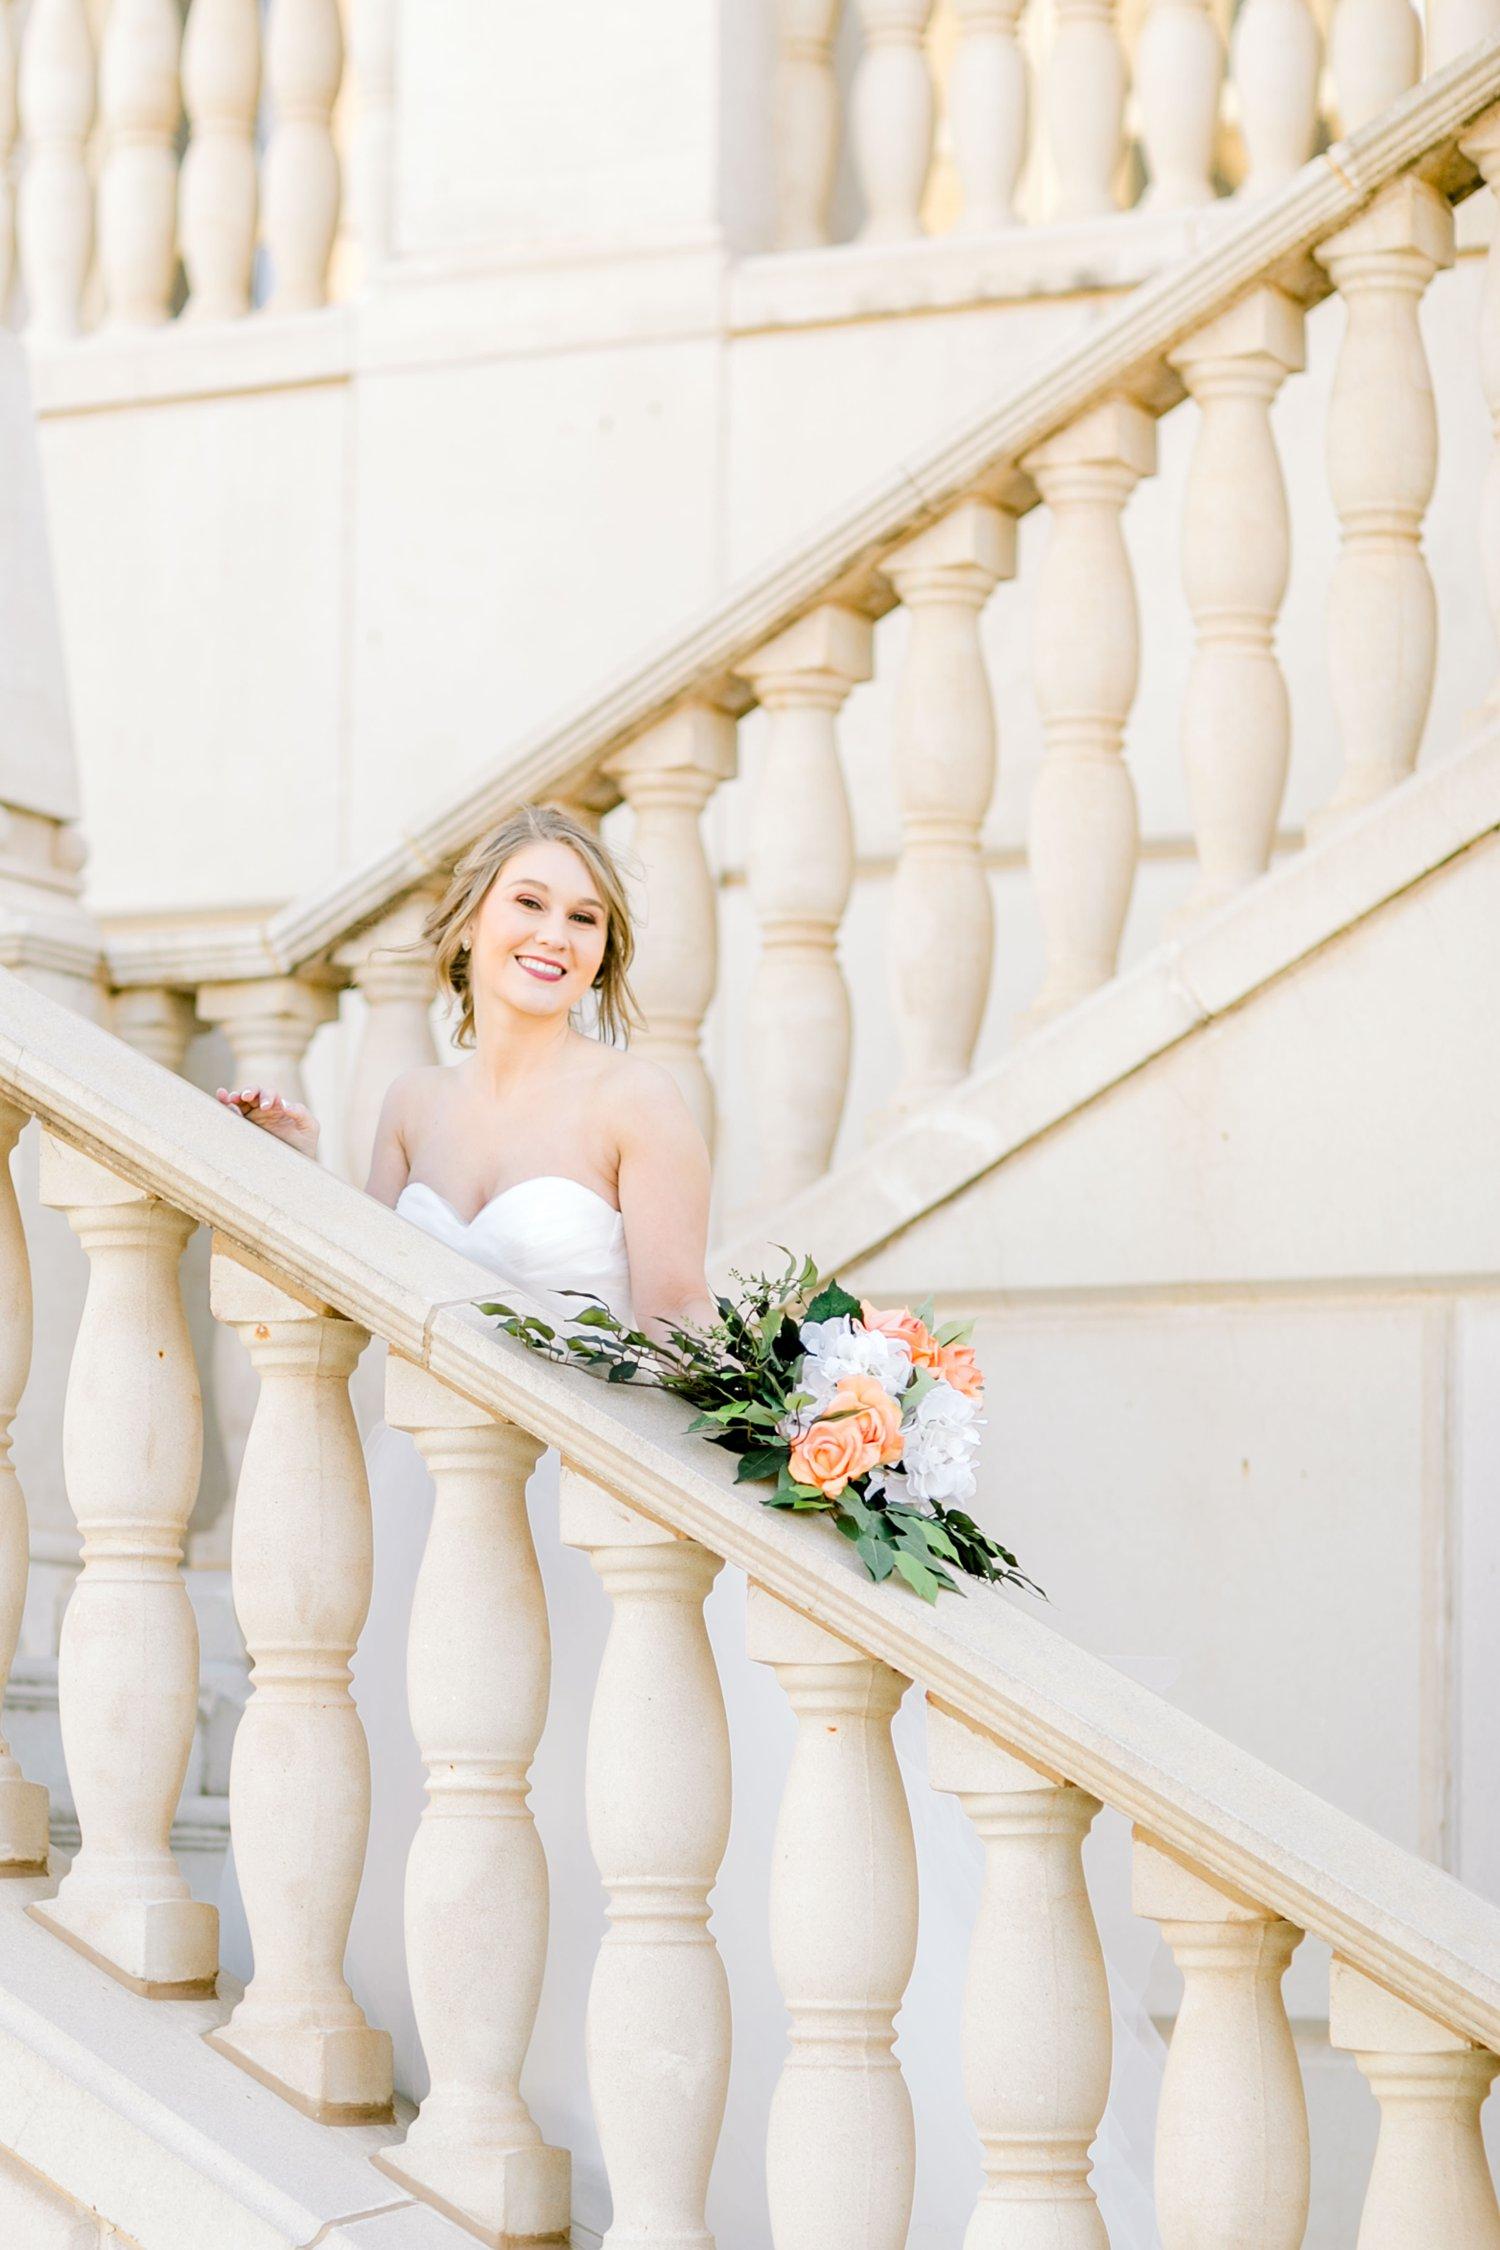 Kaila-cox-bridals-lubbock-photographer0023.jpg